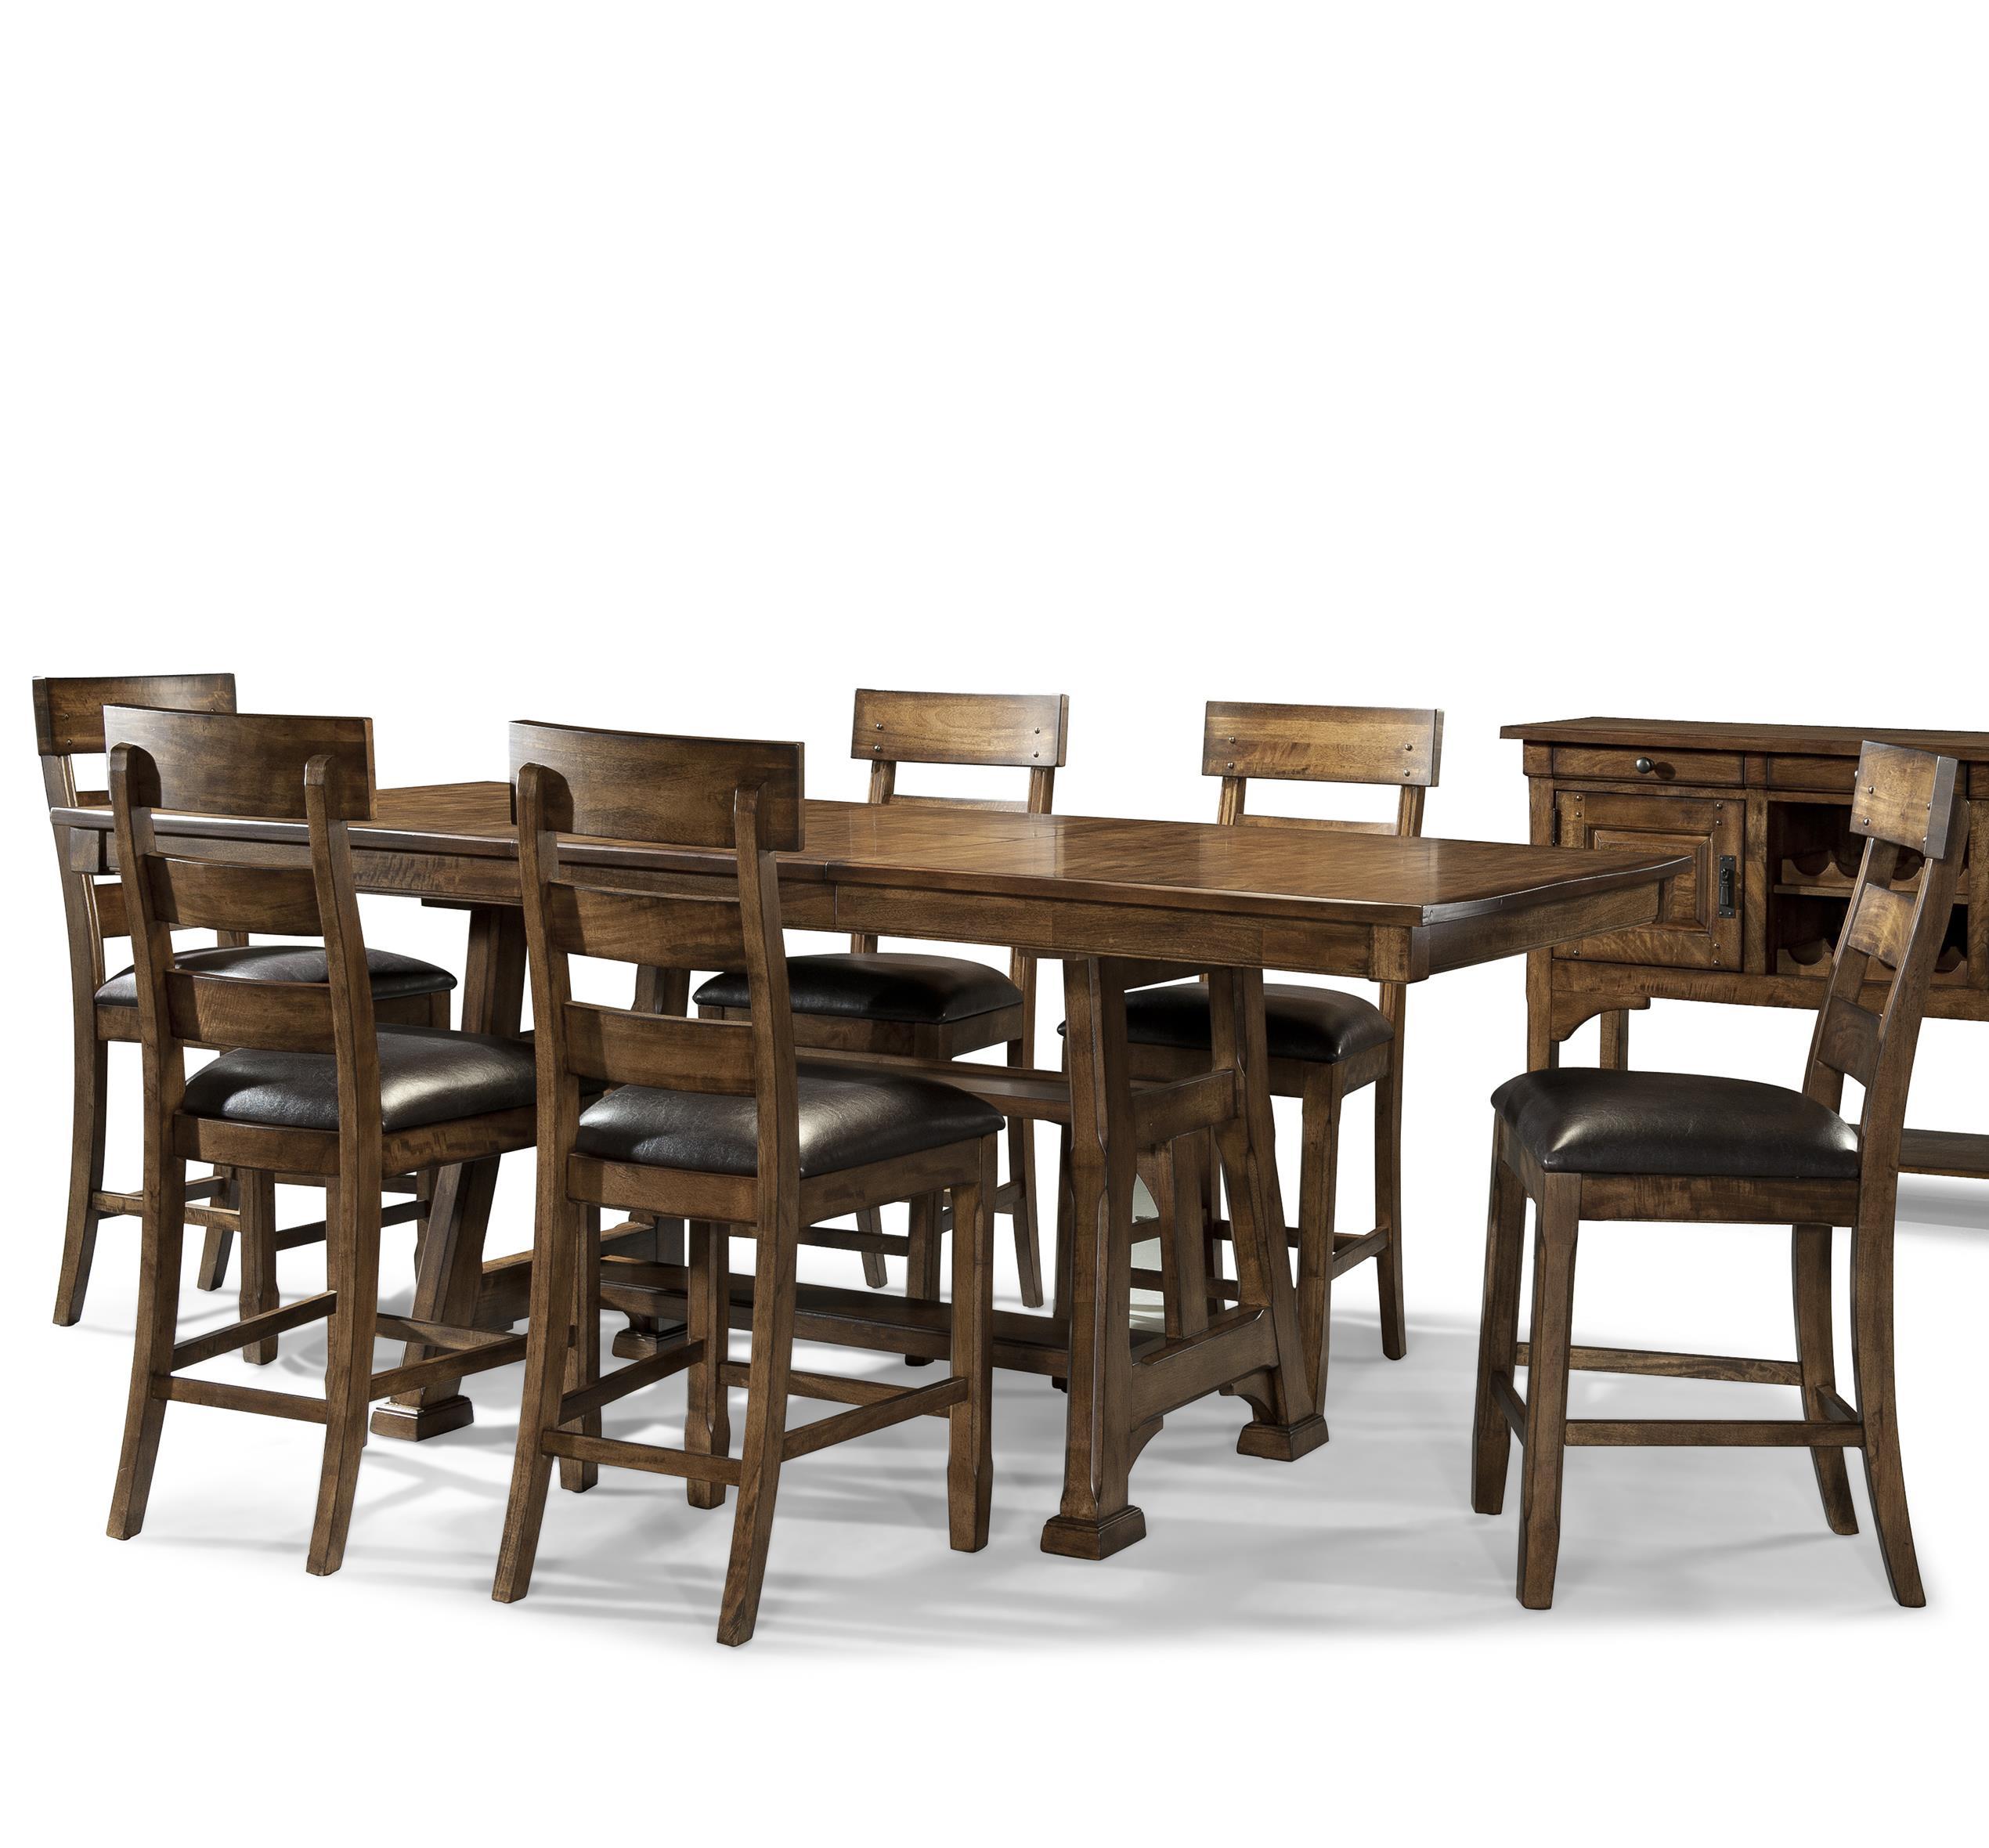 7 Piece Trestle Pub Table and Stool Set